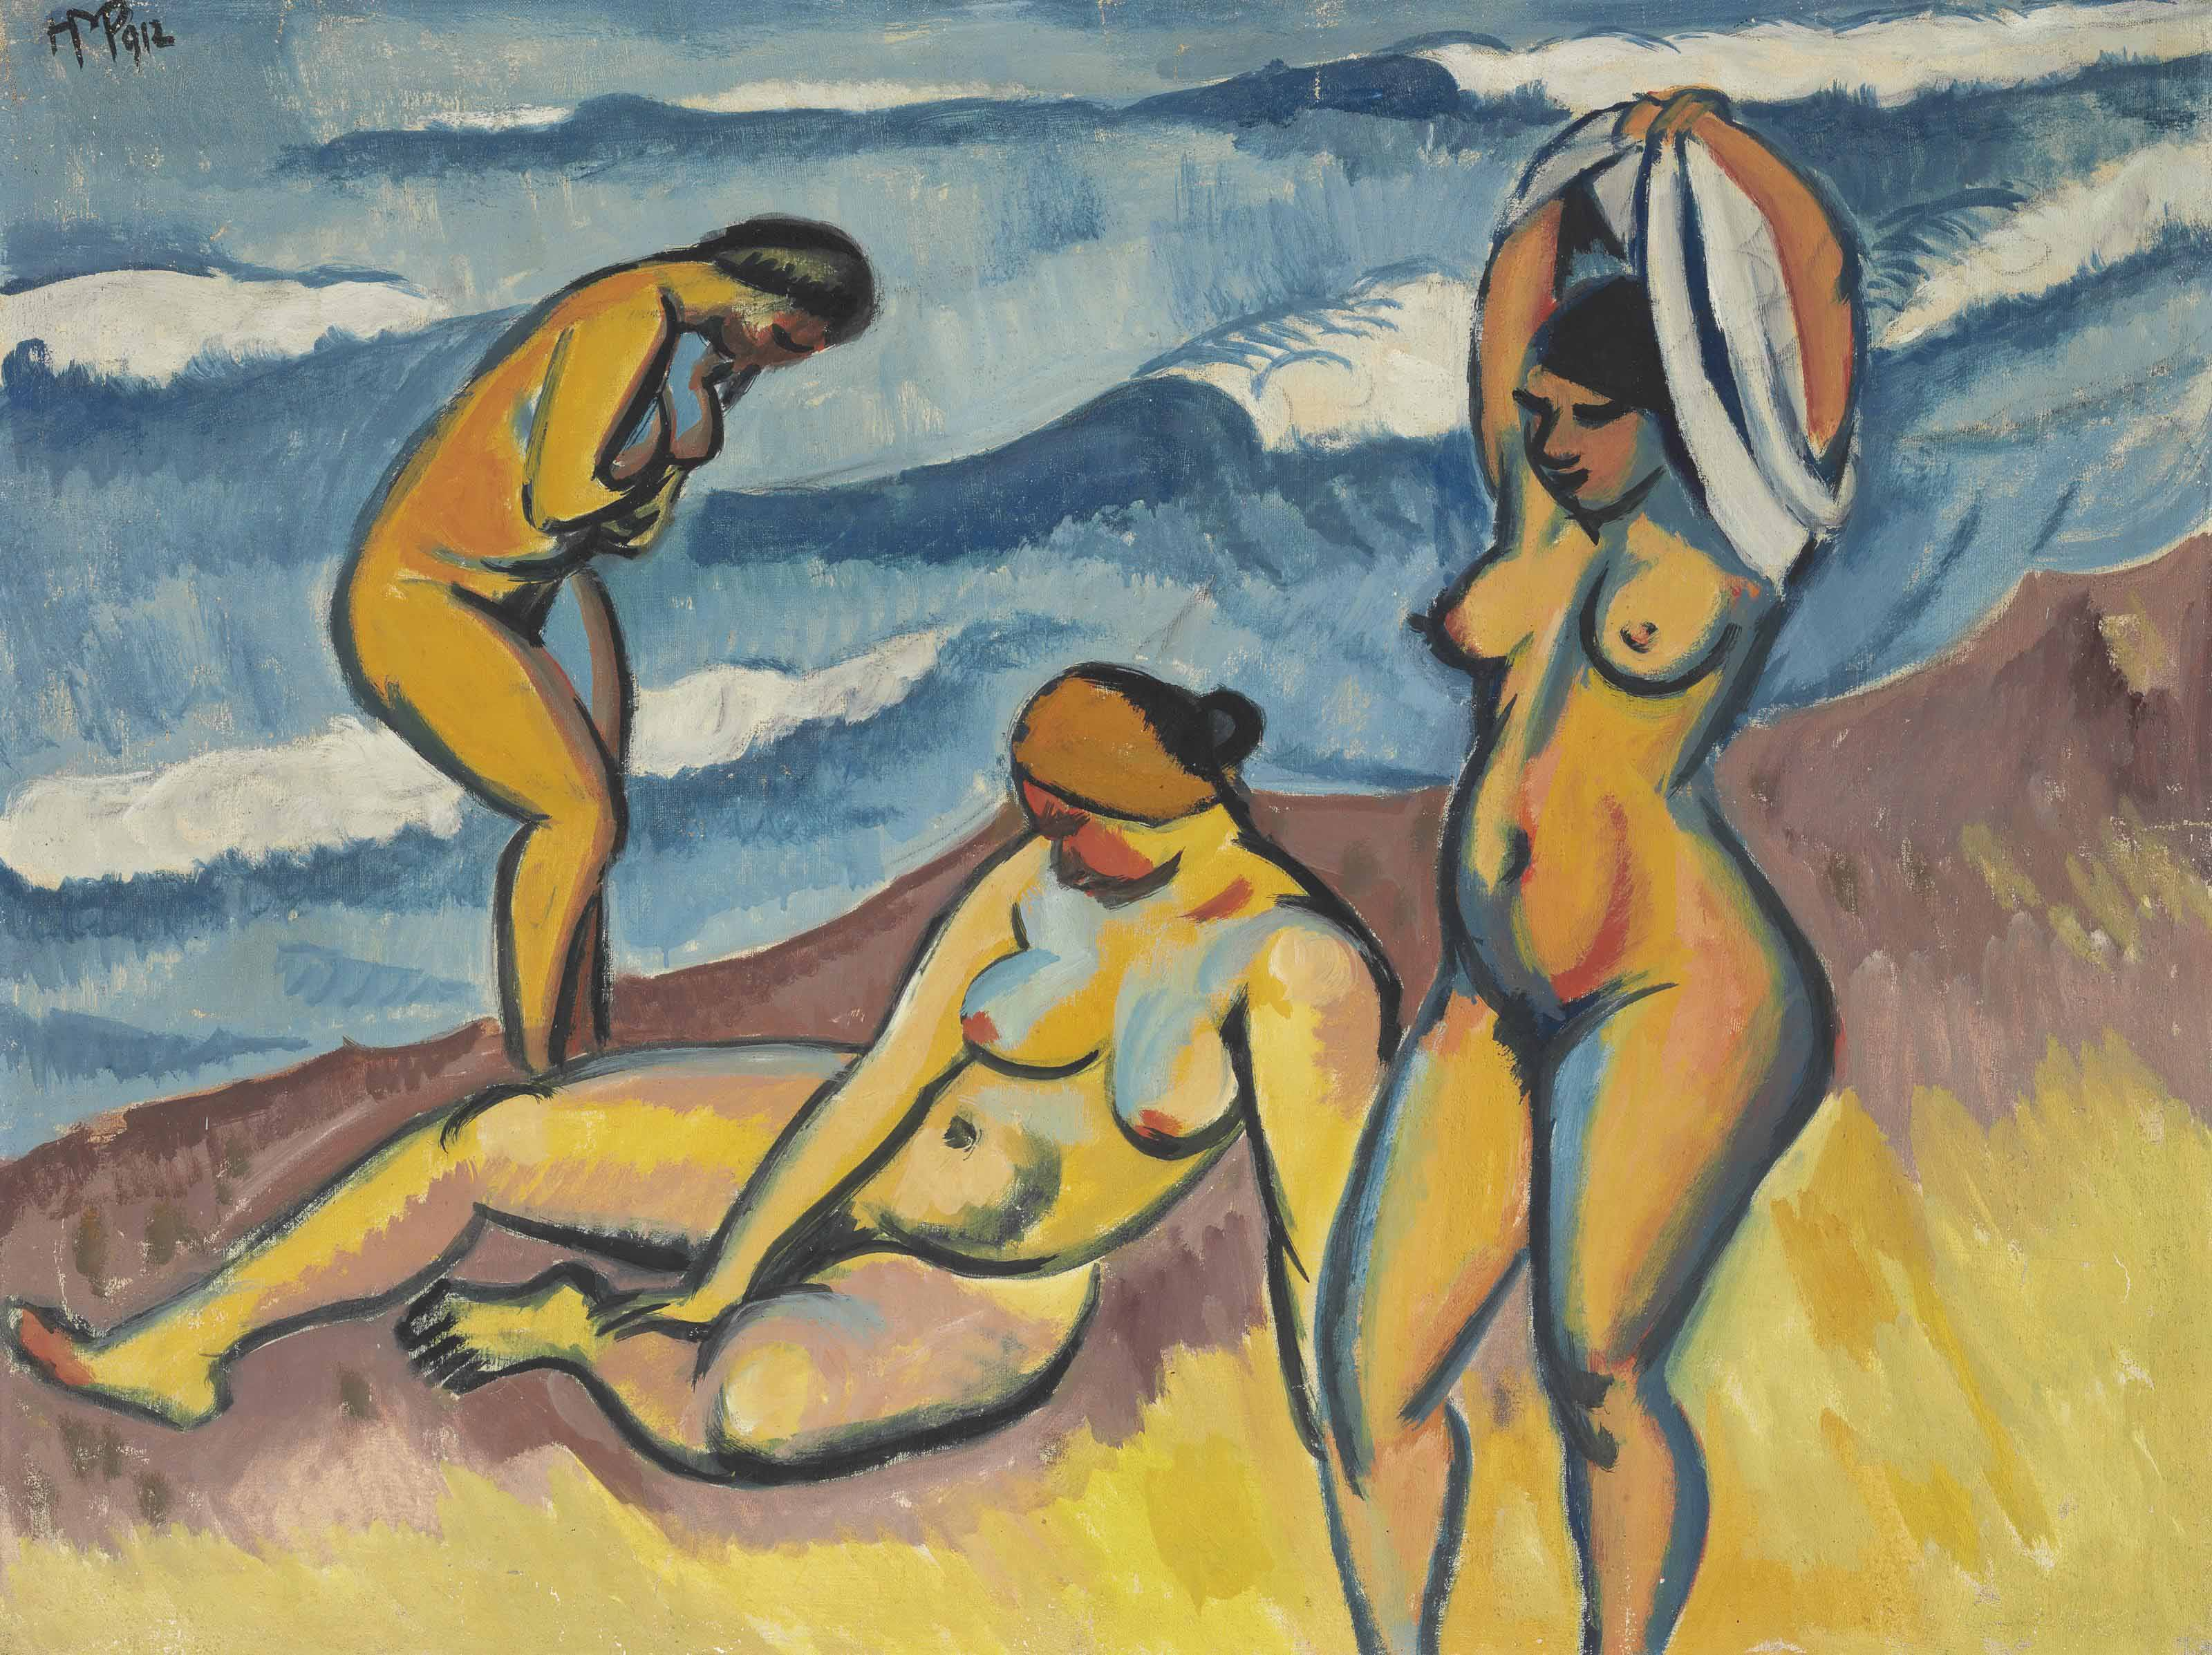 Drei badende Frauen am Meer